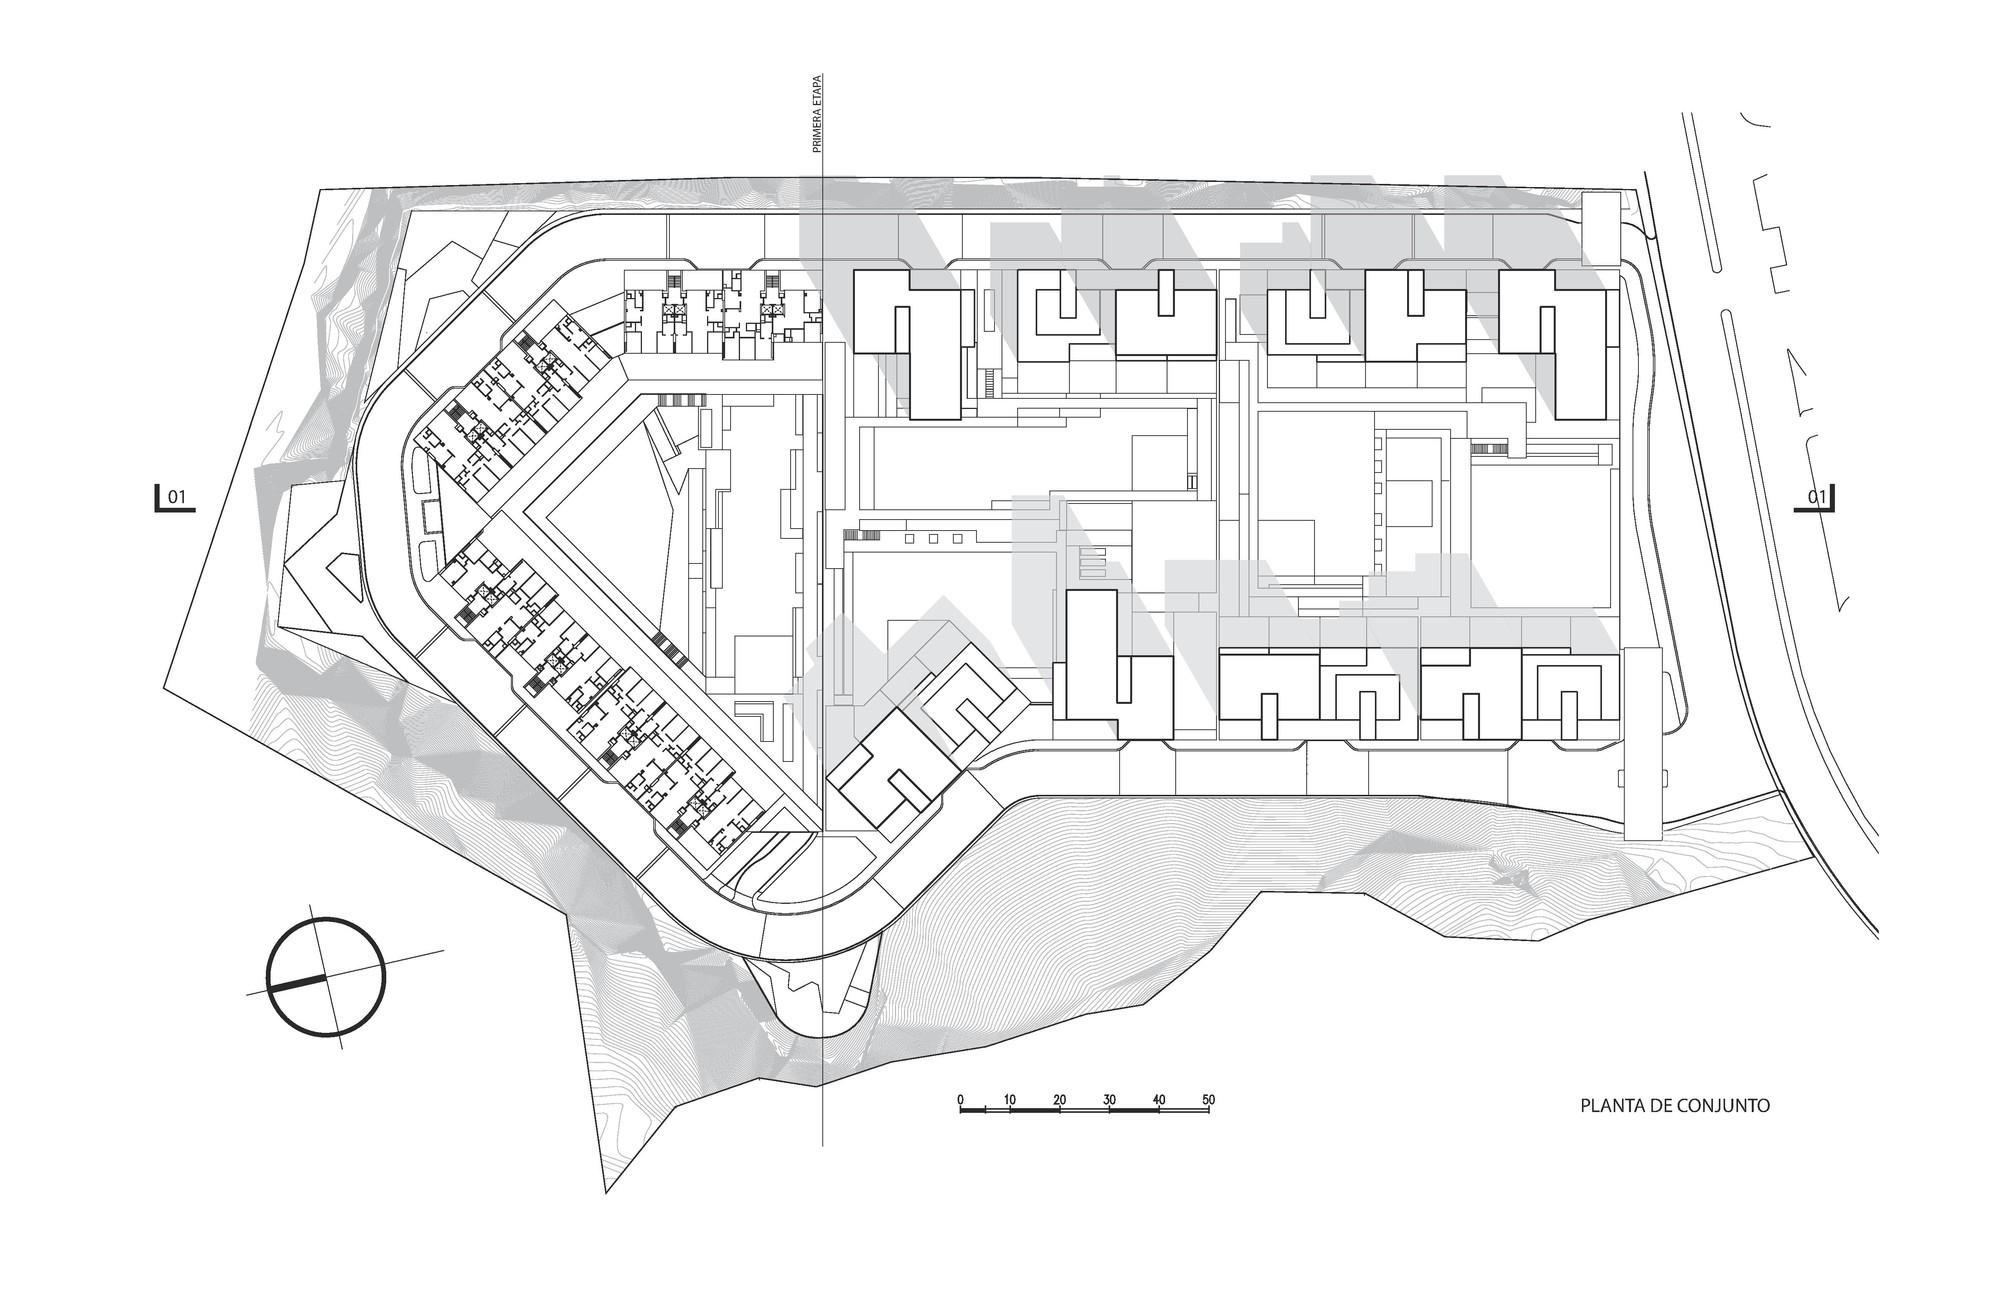 Central park primer etapa migdal arquitectos archdaily for Plantas de colegios arquitectura